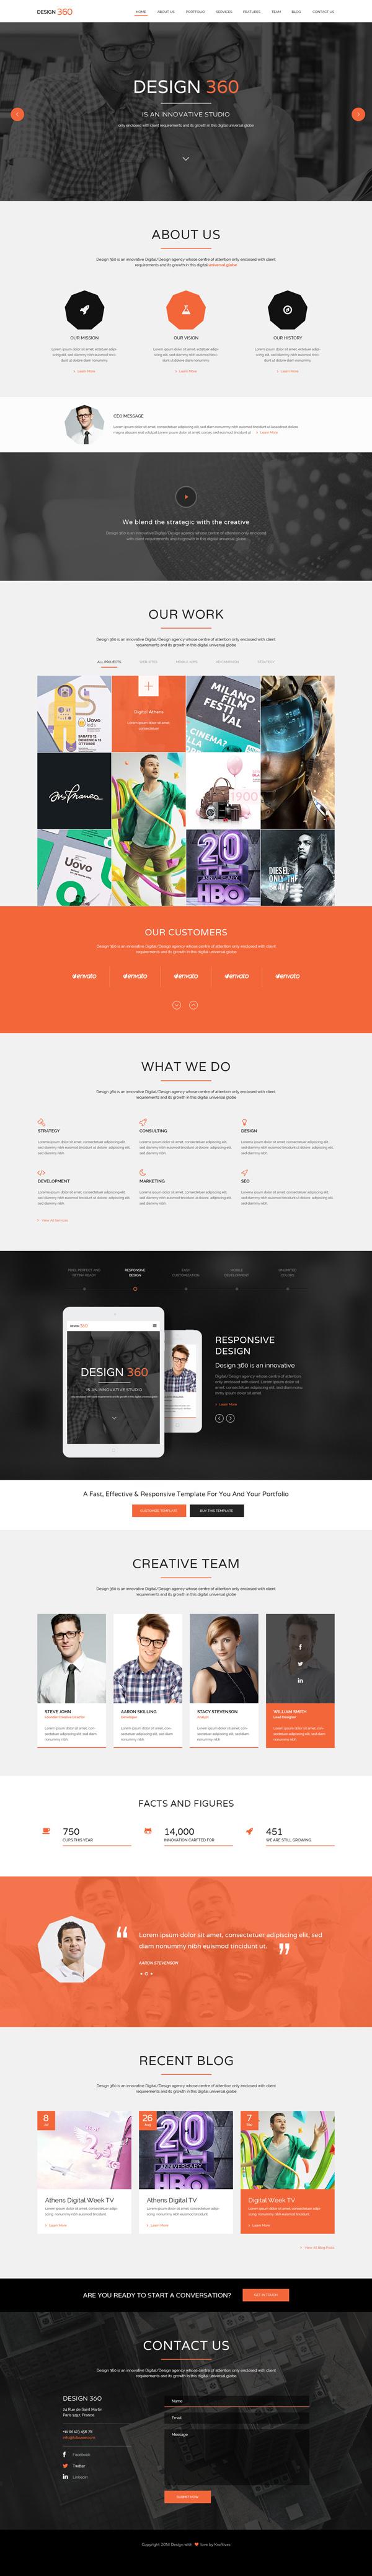 Design 360 - Single Page PSD HTML5 Template